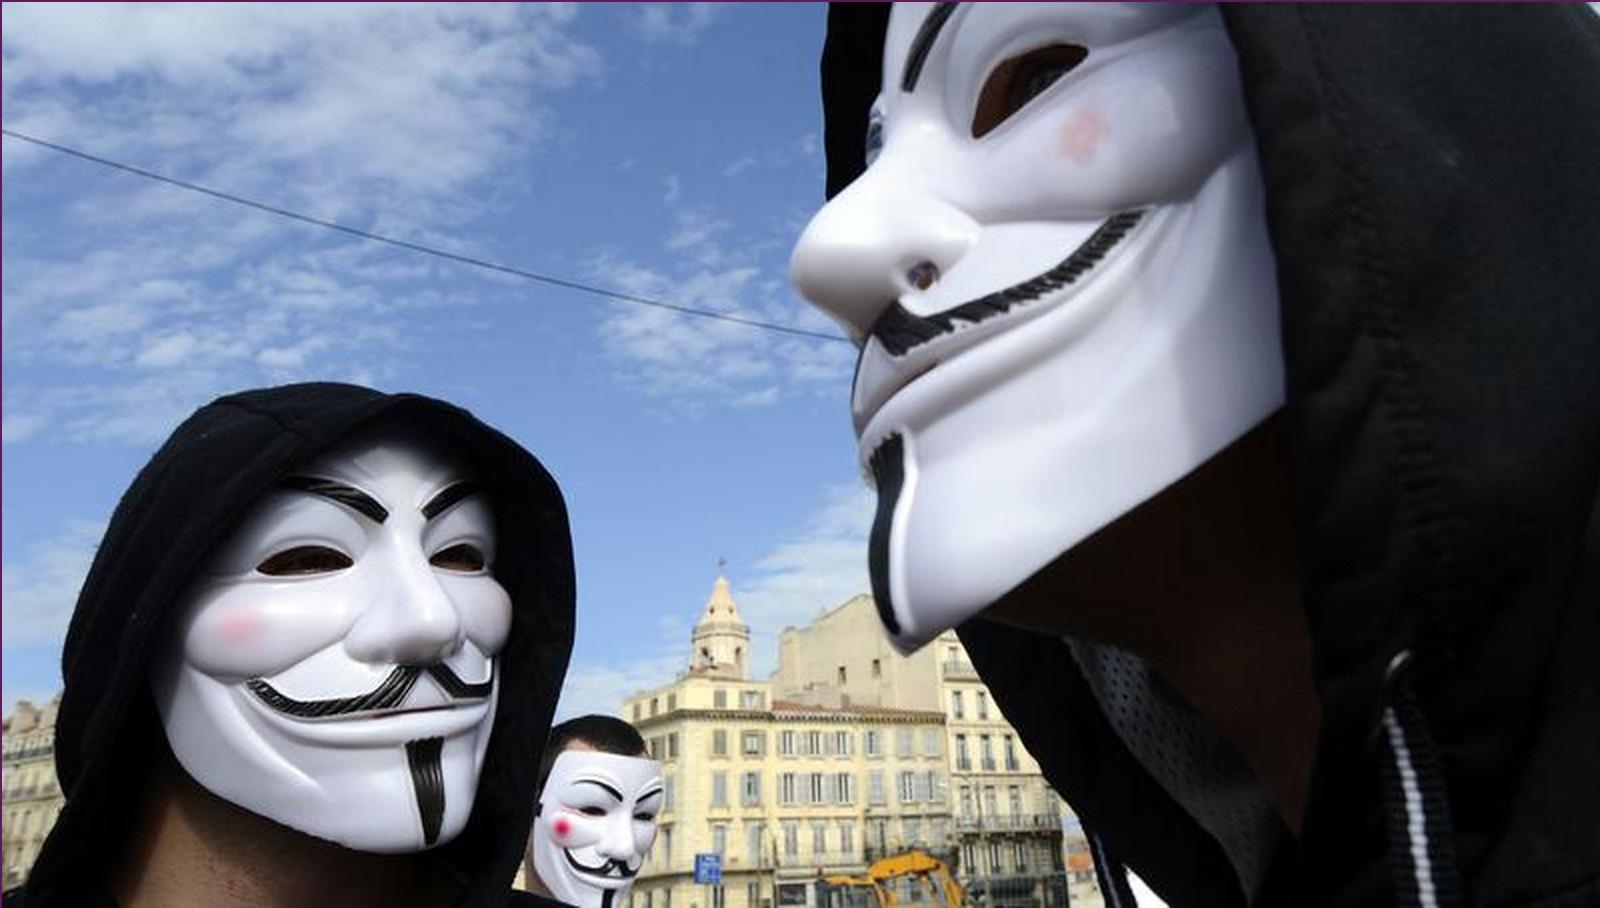 Anonymous hacked US Census Bureau